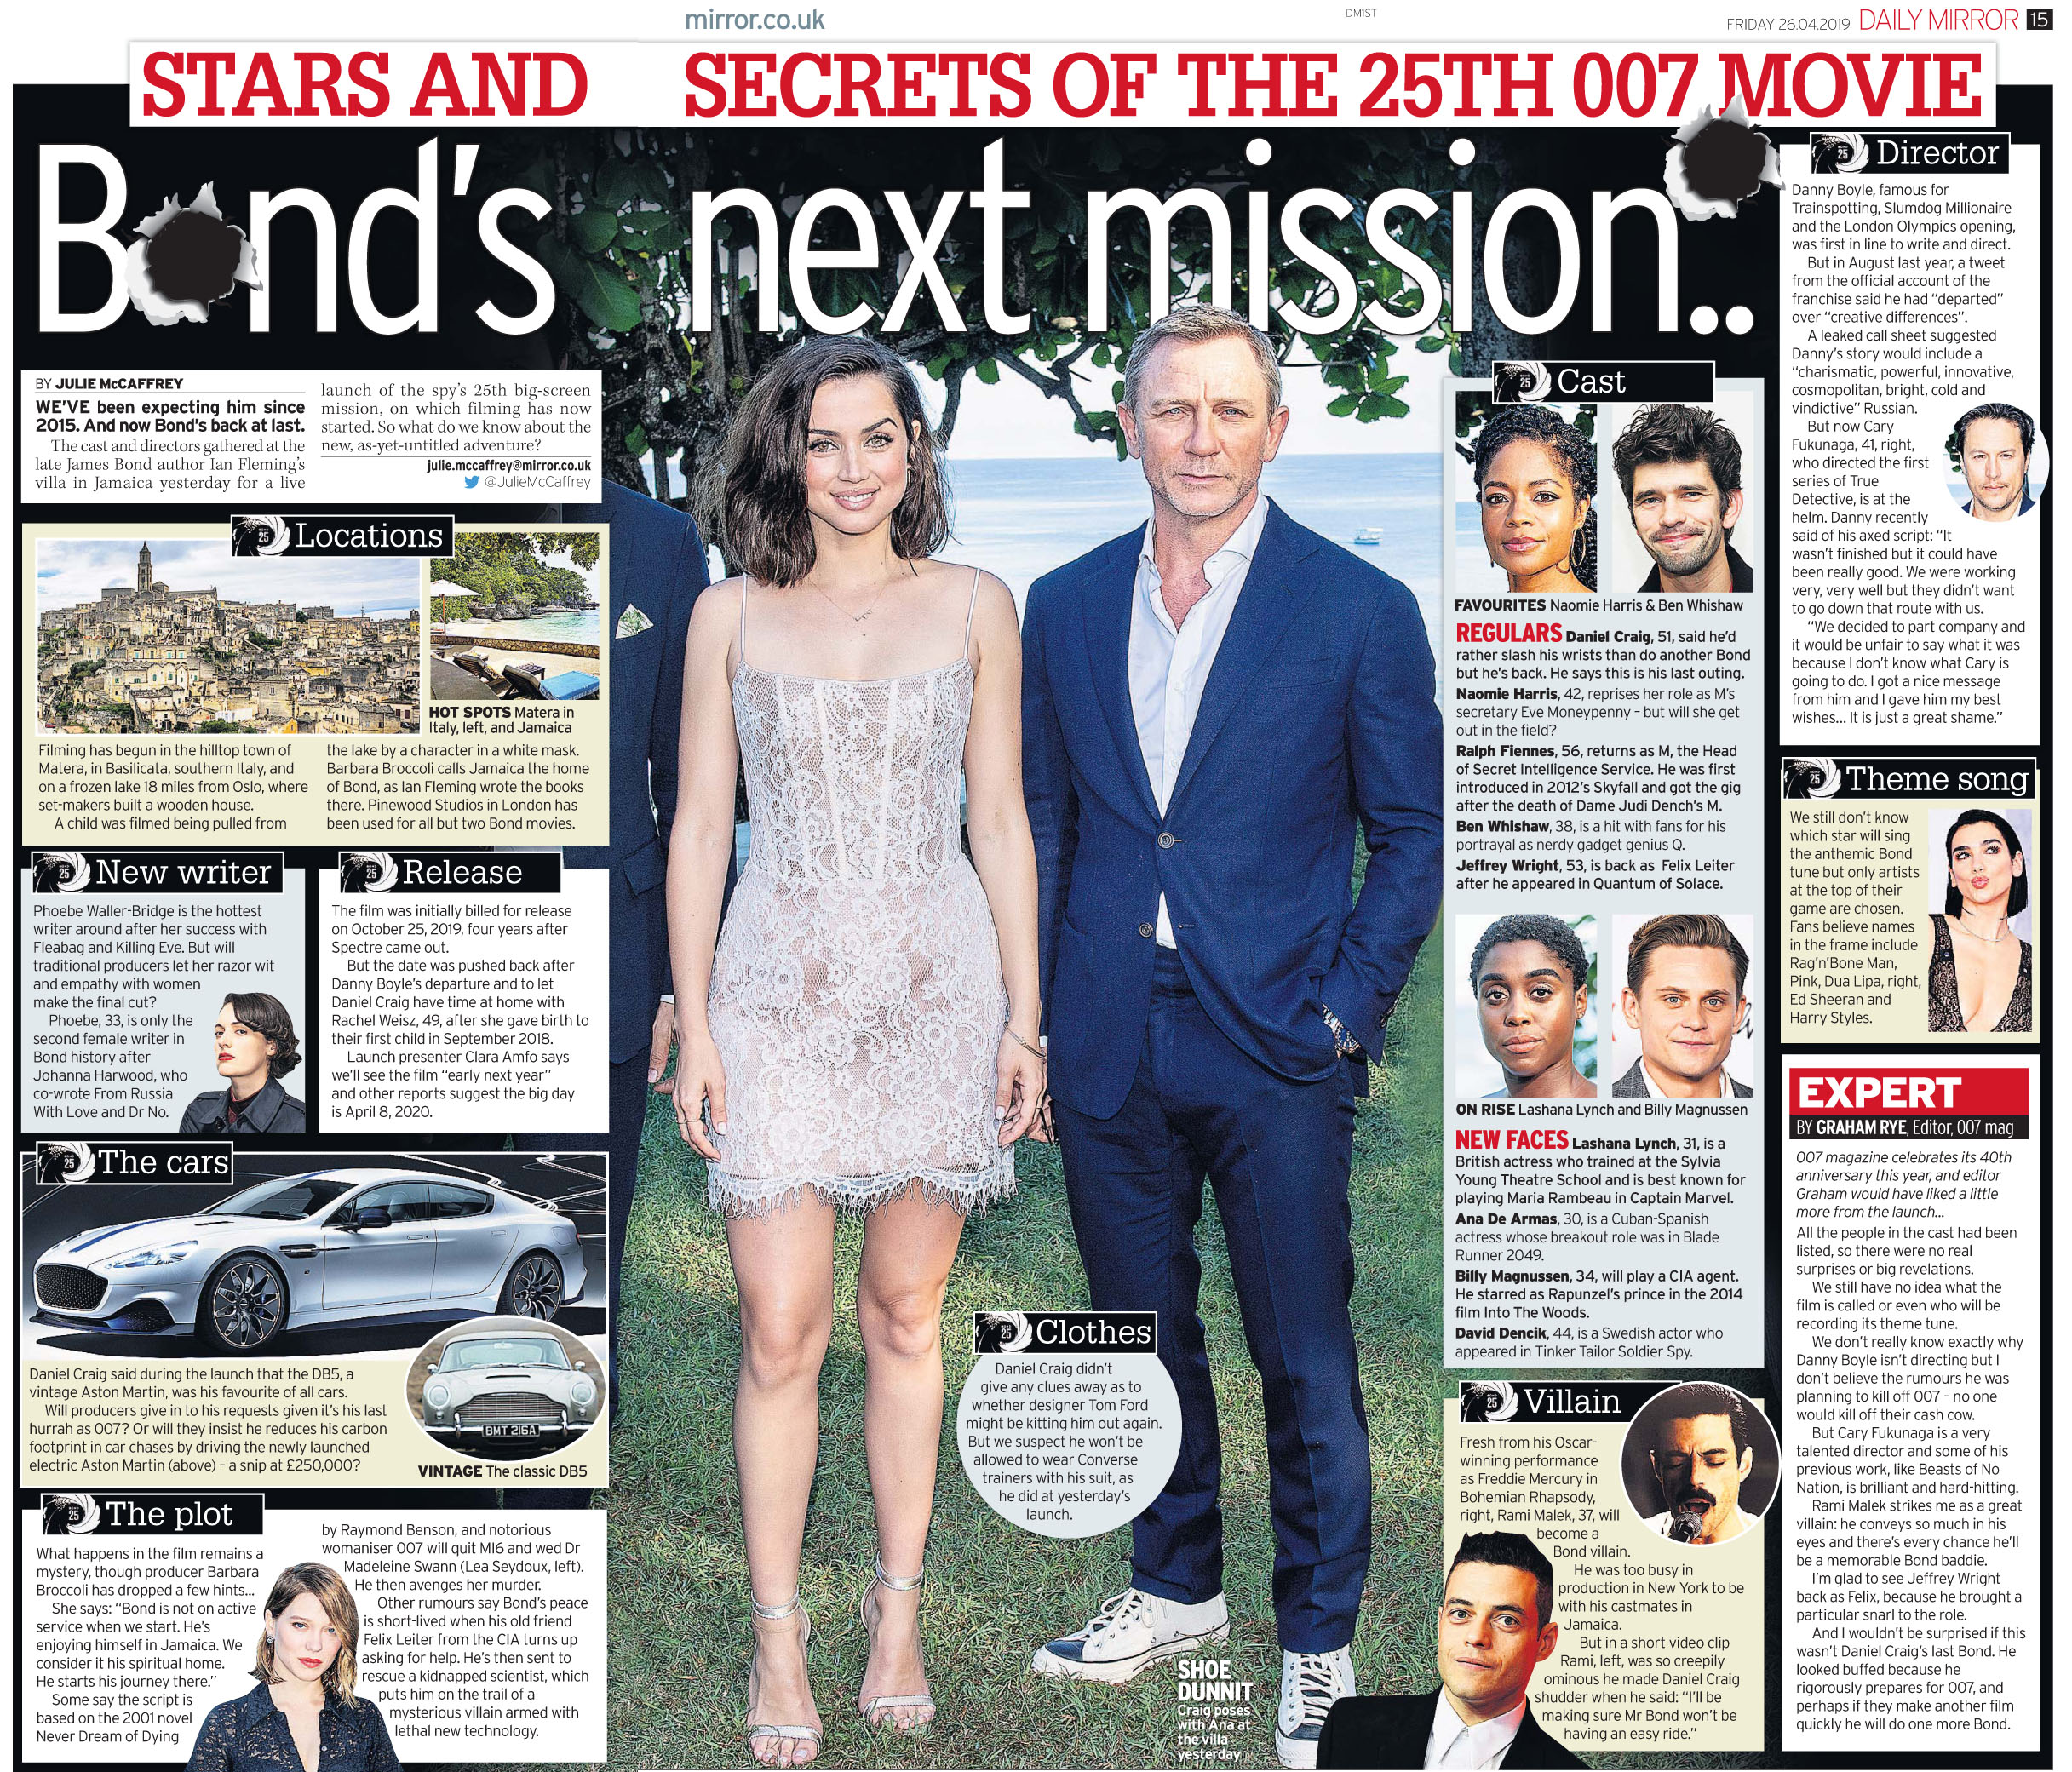 Daily Mirror April 26 2019 Bond 25.jpg